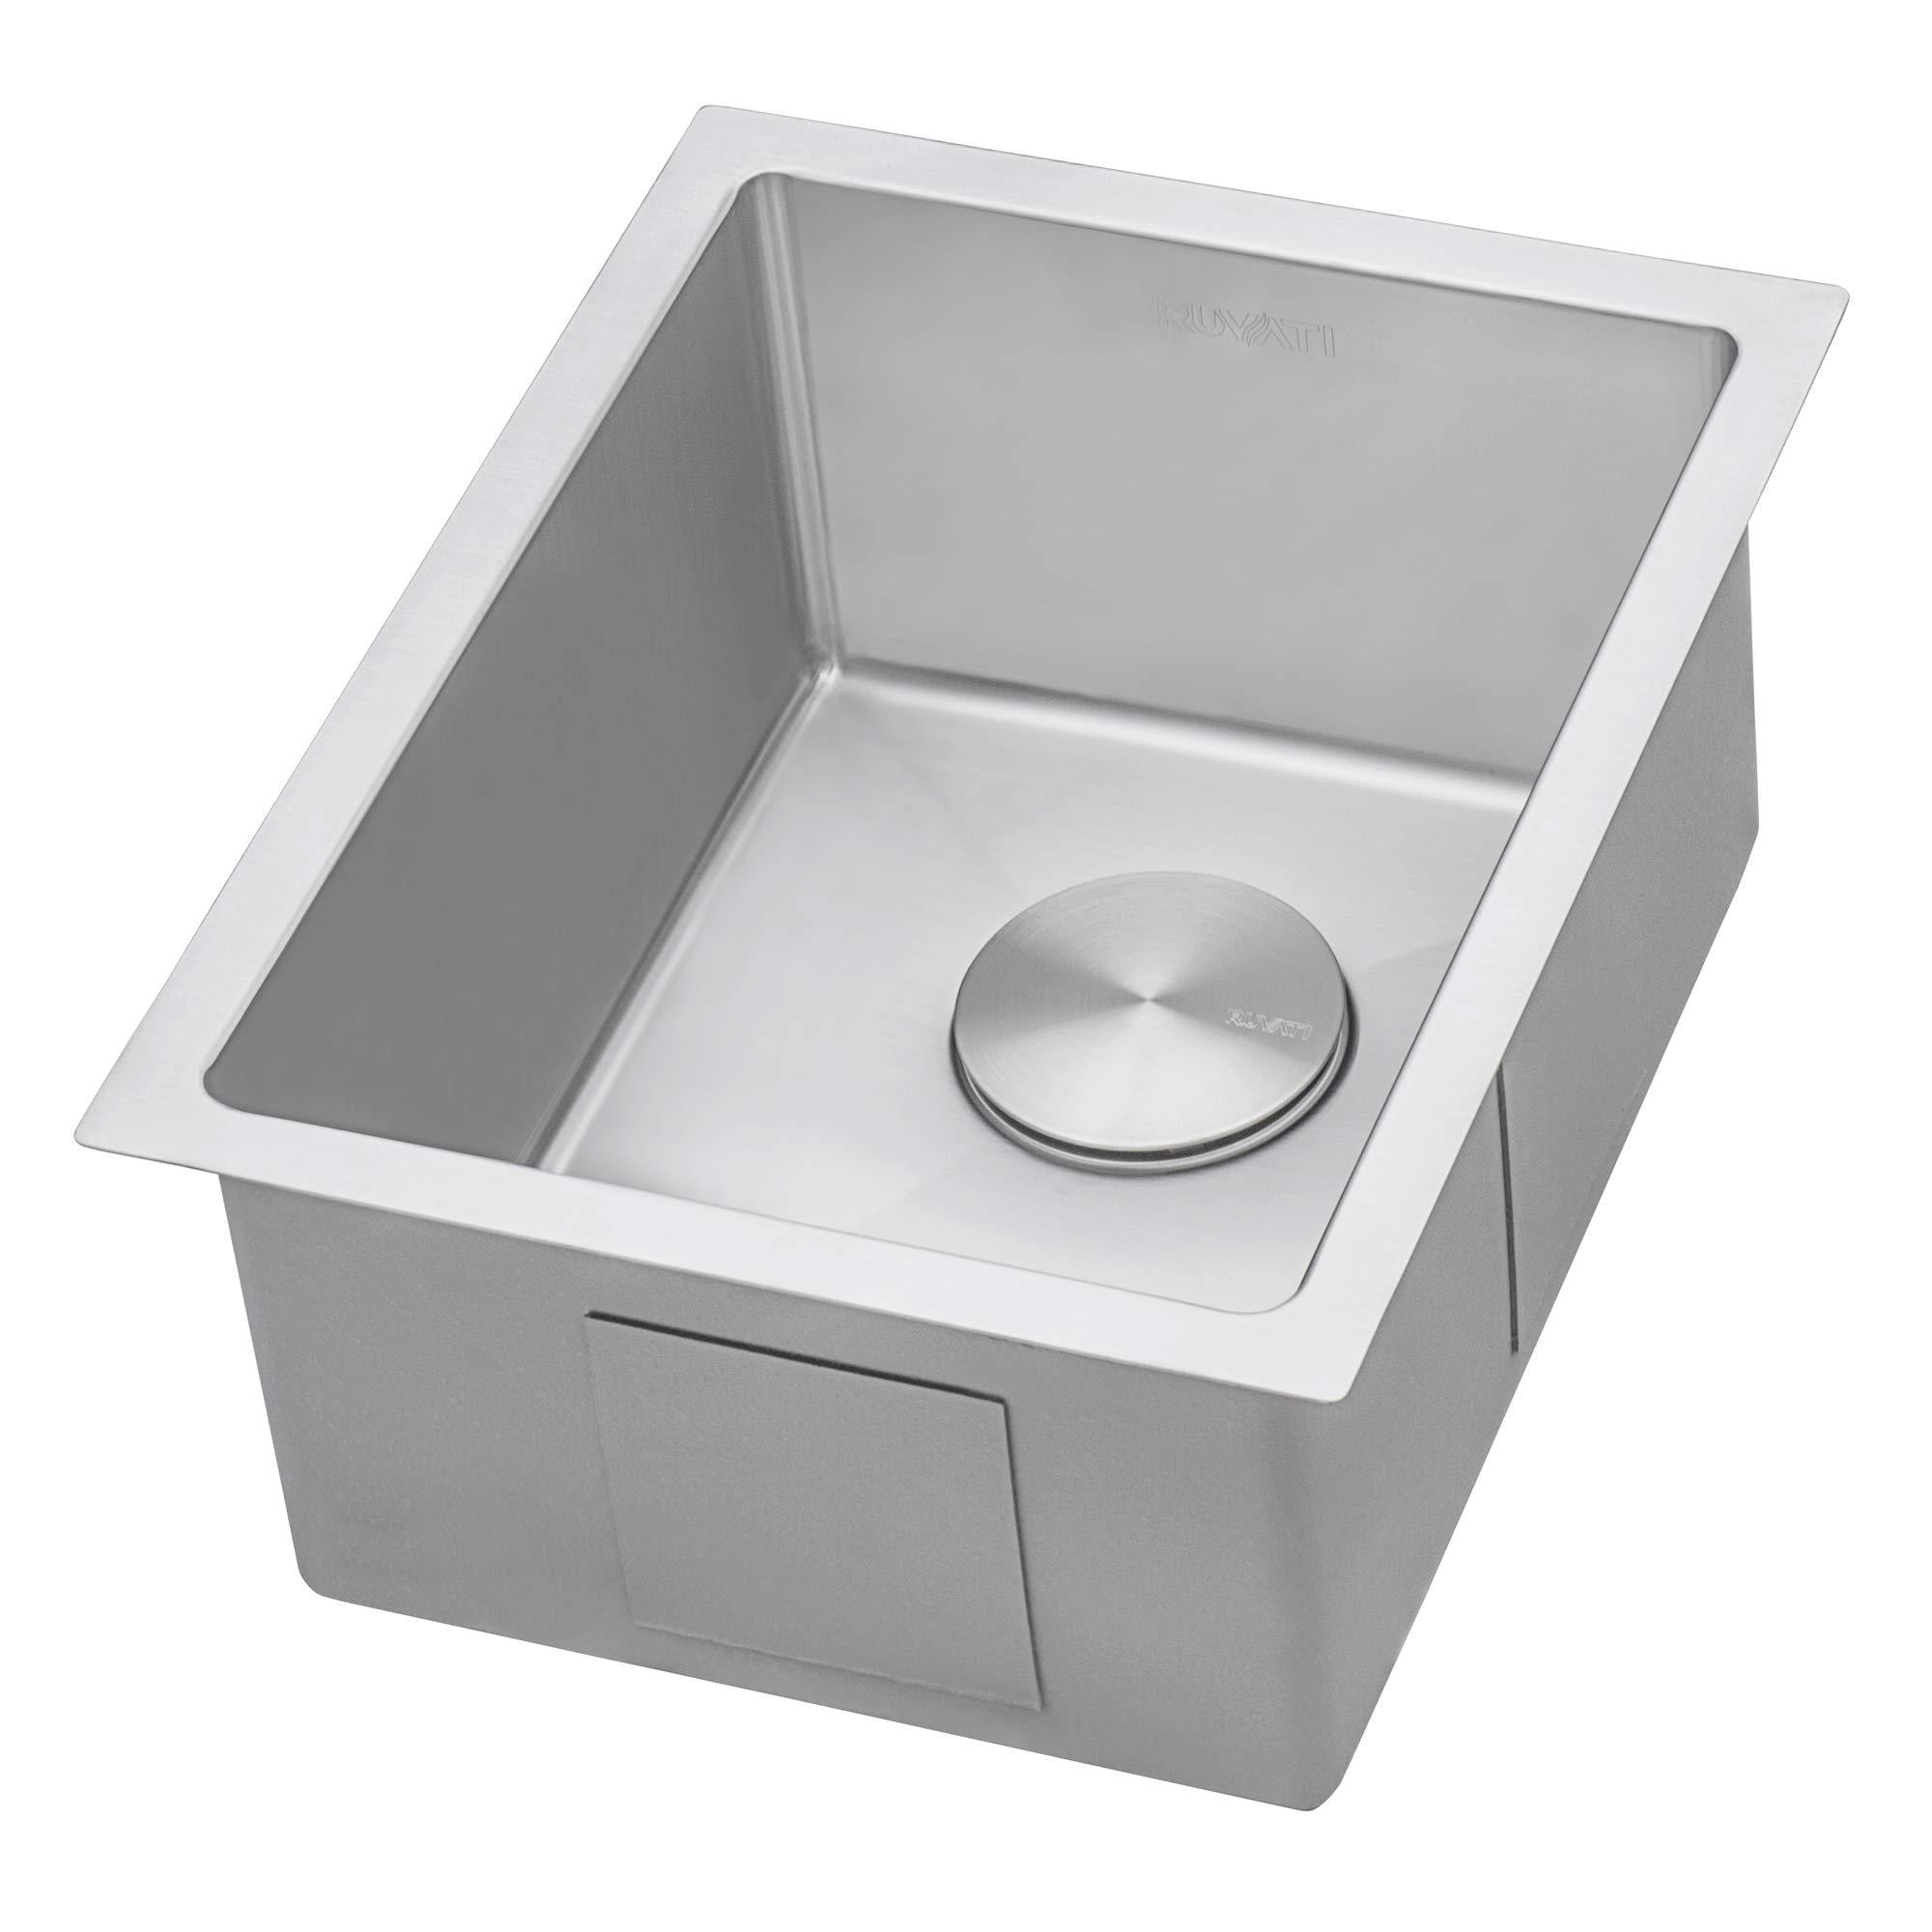 Ruvati 14-inch Undermount Wet Bar Prep Sink Tight Radius 16 Gauge Stainless Steel Single Bowl - RVH7114 by Ruvati (Image #4)